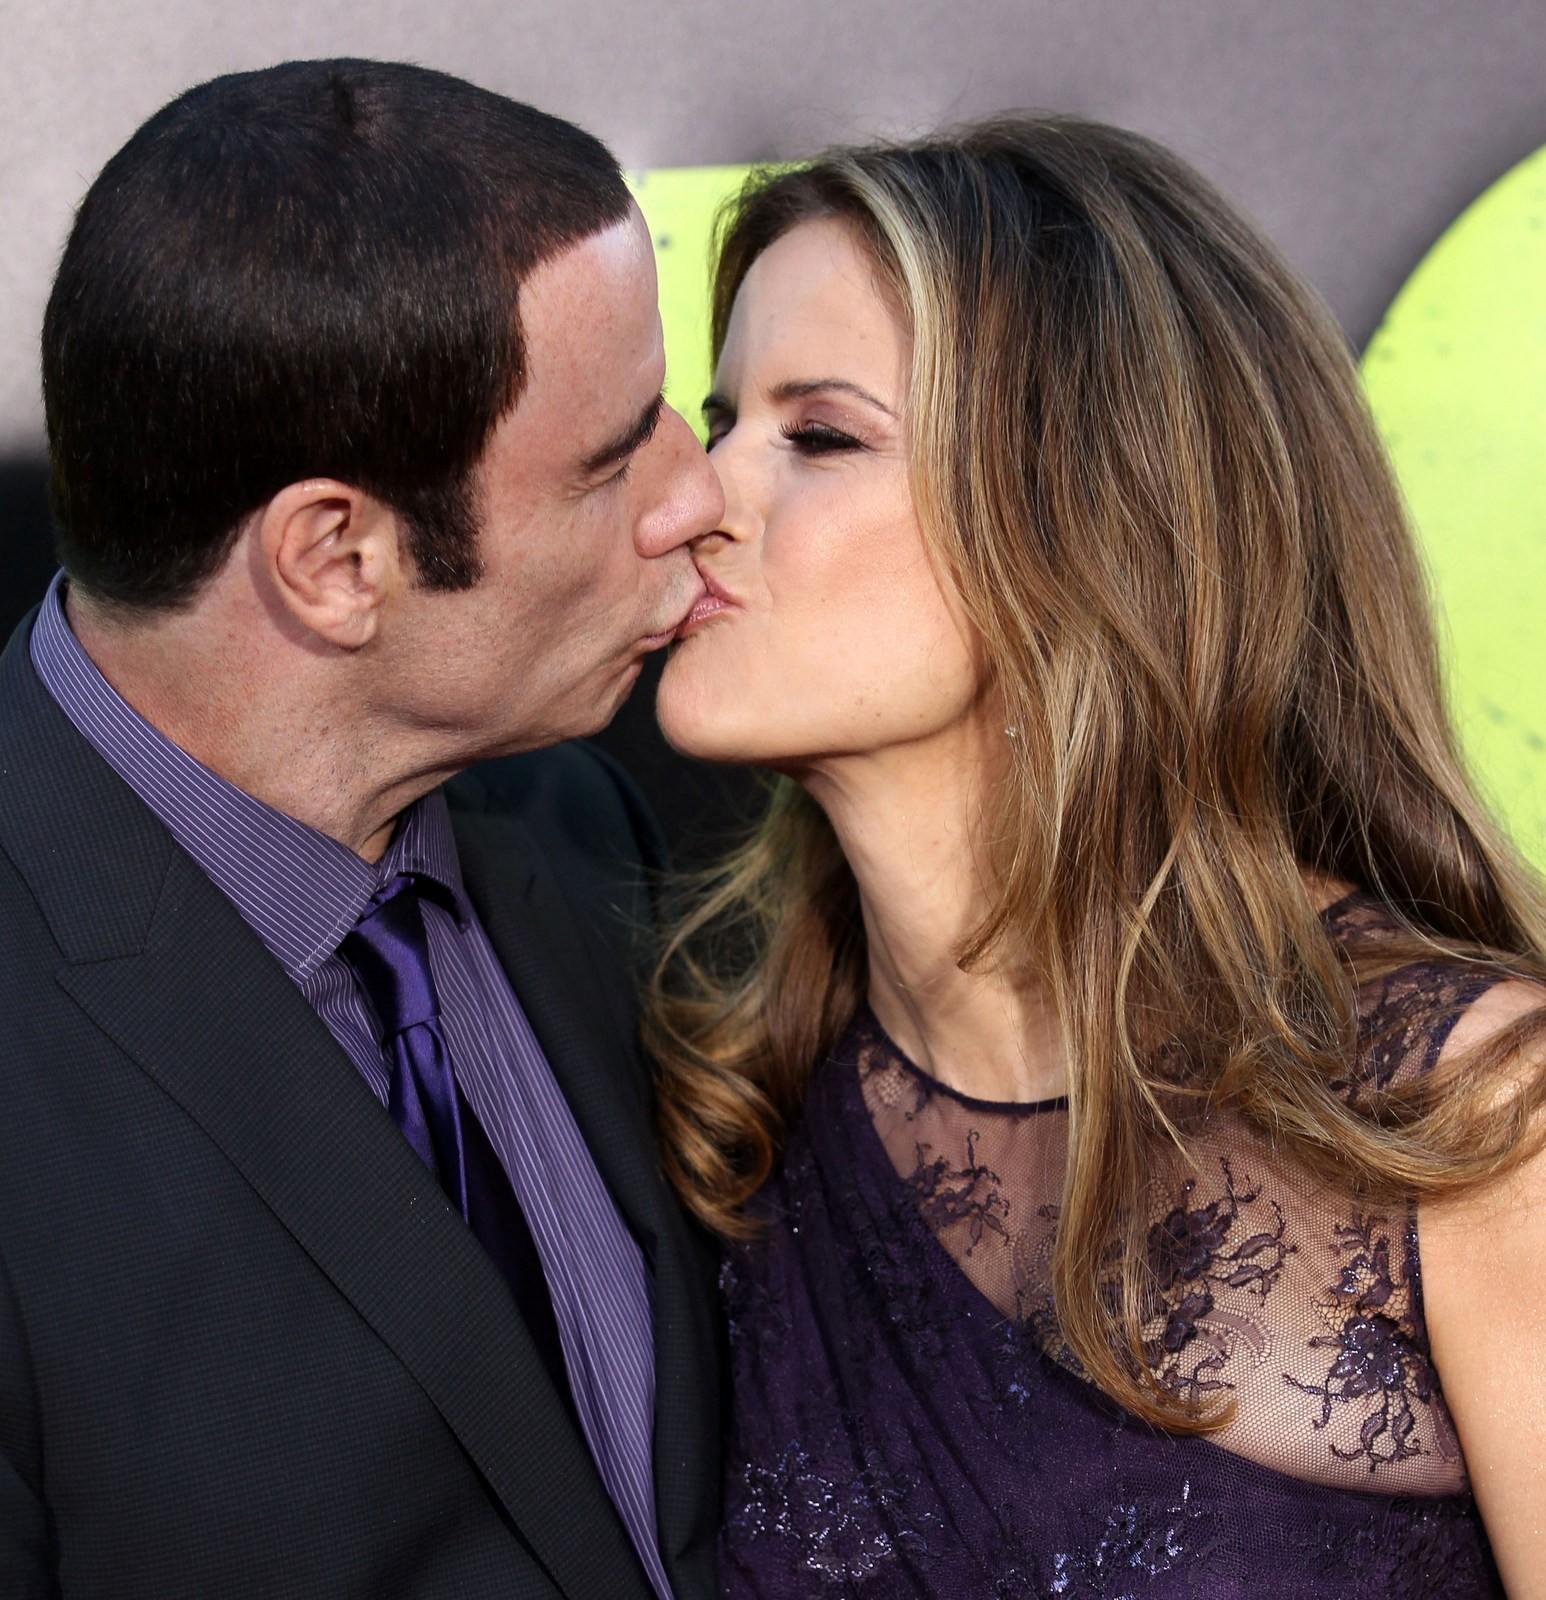 John Travolta Kelly Preston kiss Savages premiere